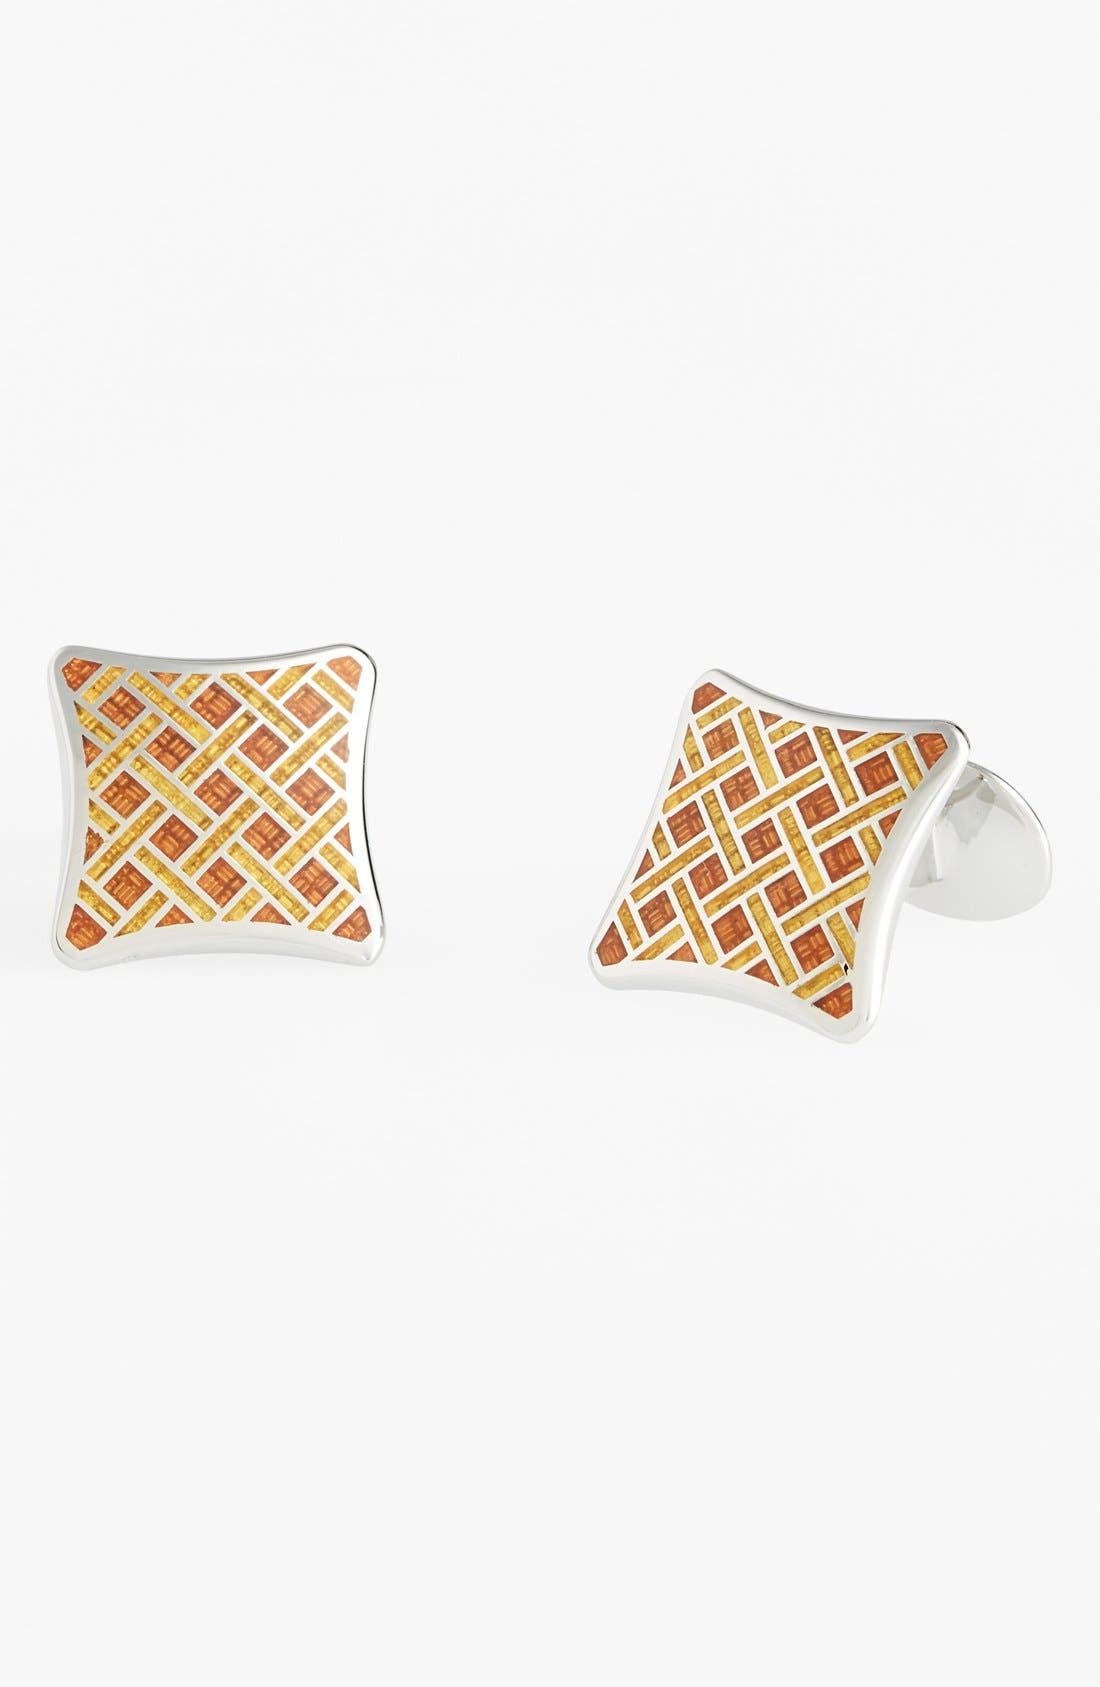 Enamel & Sterling Silver Cuff Links,                         Main,                         color, Silver/ Burnt Orange/ Gold